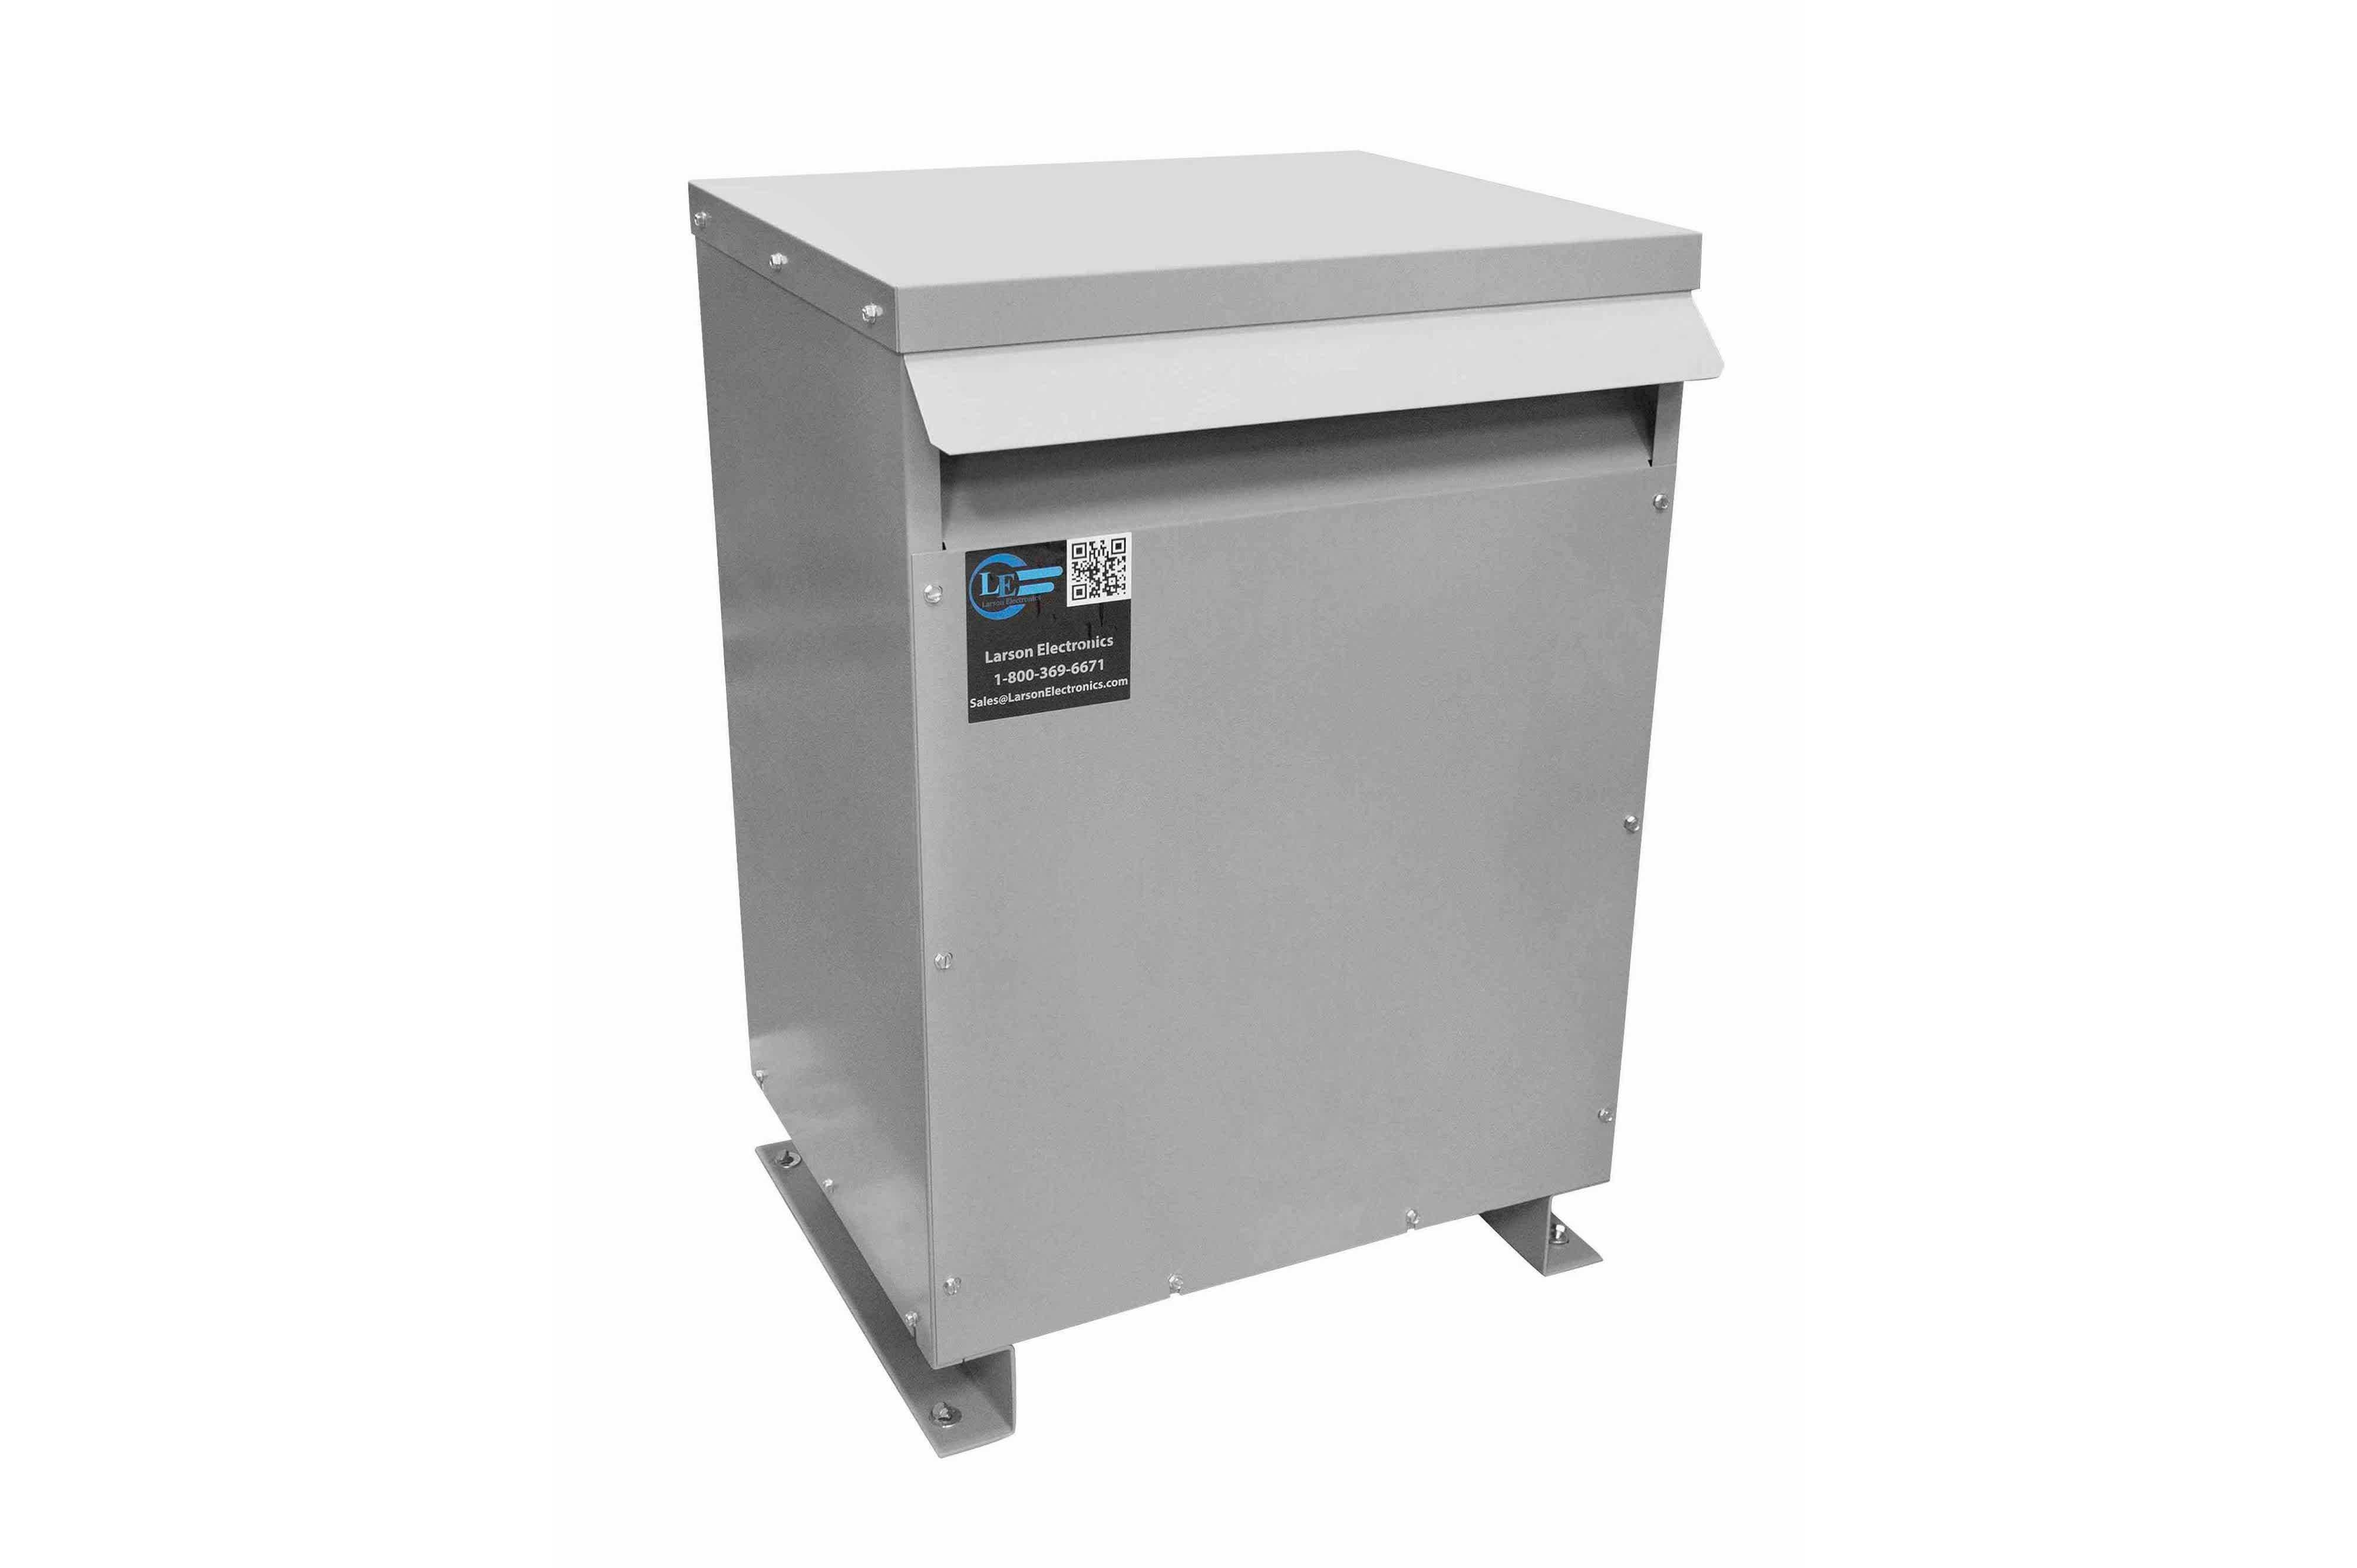 200 kVA 3PH Isolation Transformer, 600V Wye Primary, 415Y/240 Wye-N Secondary, N3R, Ventilated, 60 Hz